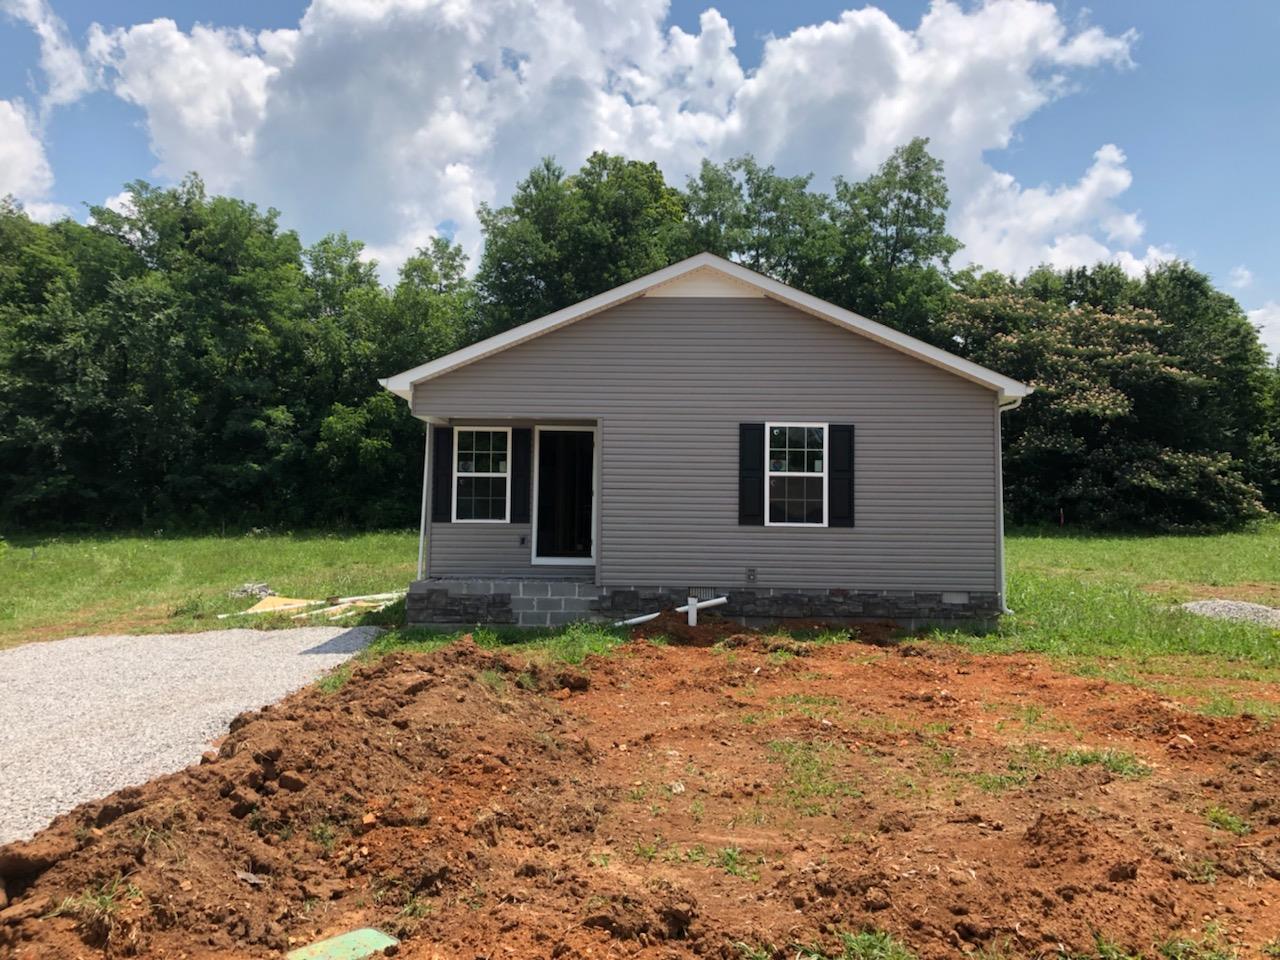 704 Garner St, Cowan, TN 37318 - Cowan, TN real estate listing